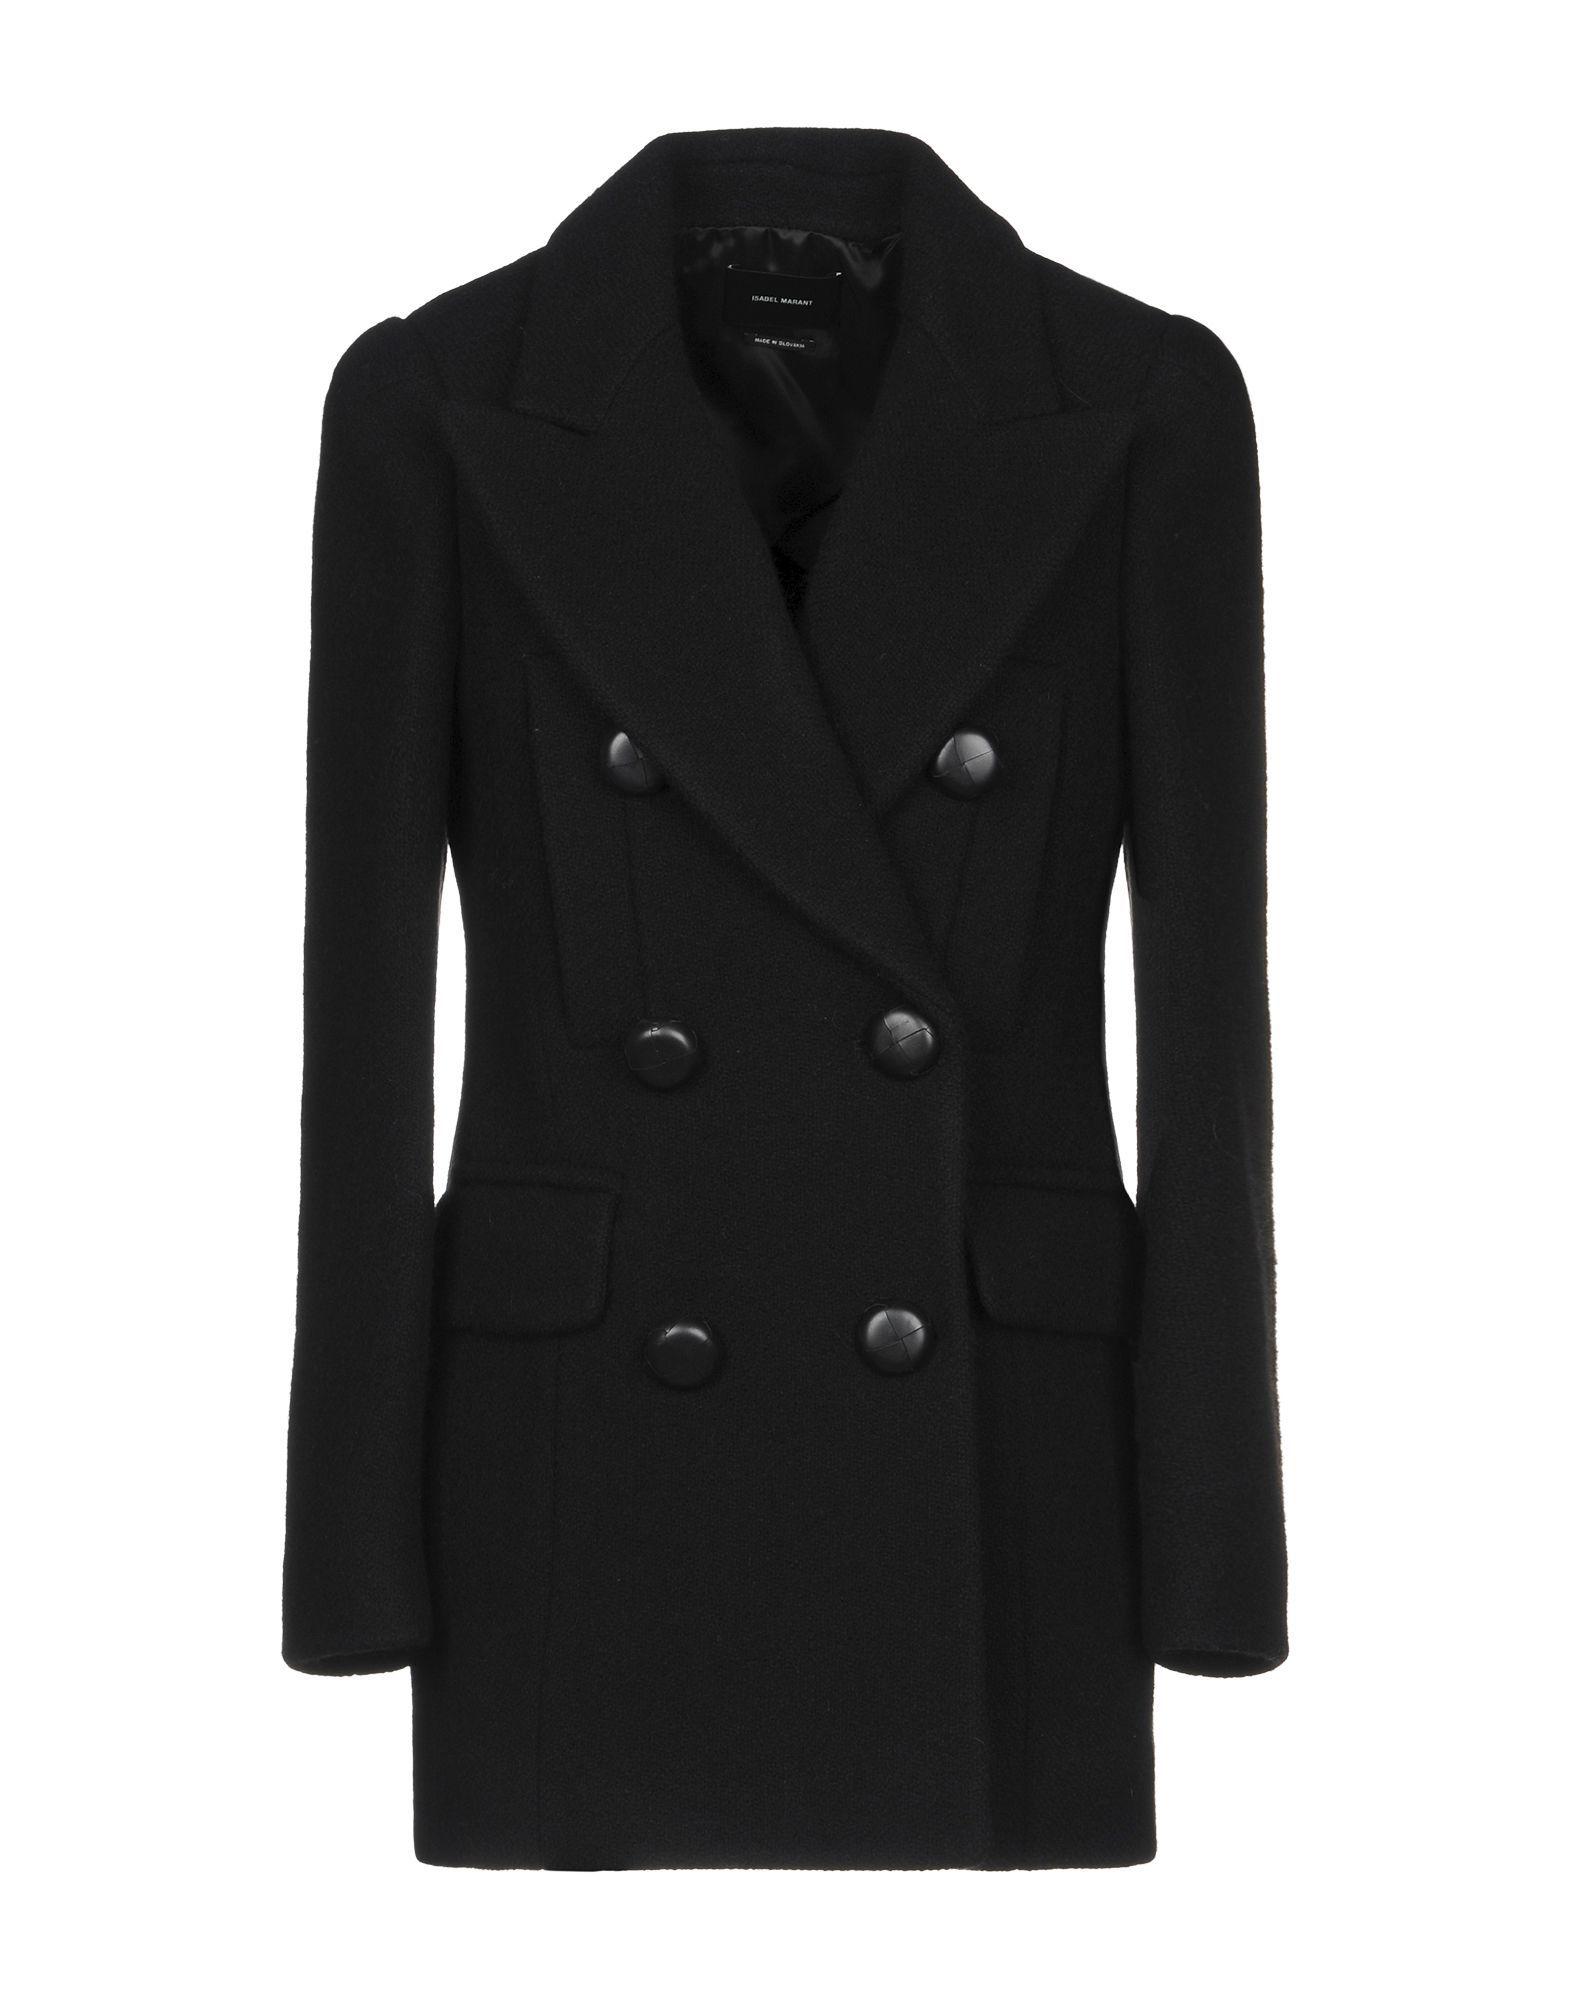 Isabel Marant Black Virgin Wool Double Breasted Jacket